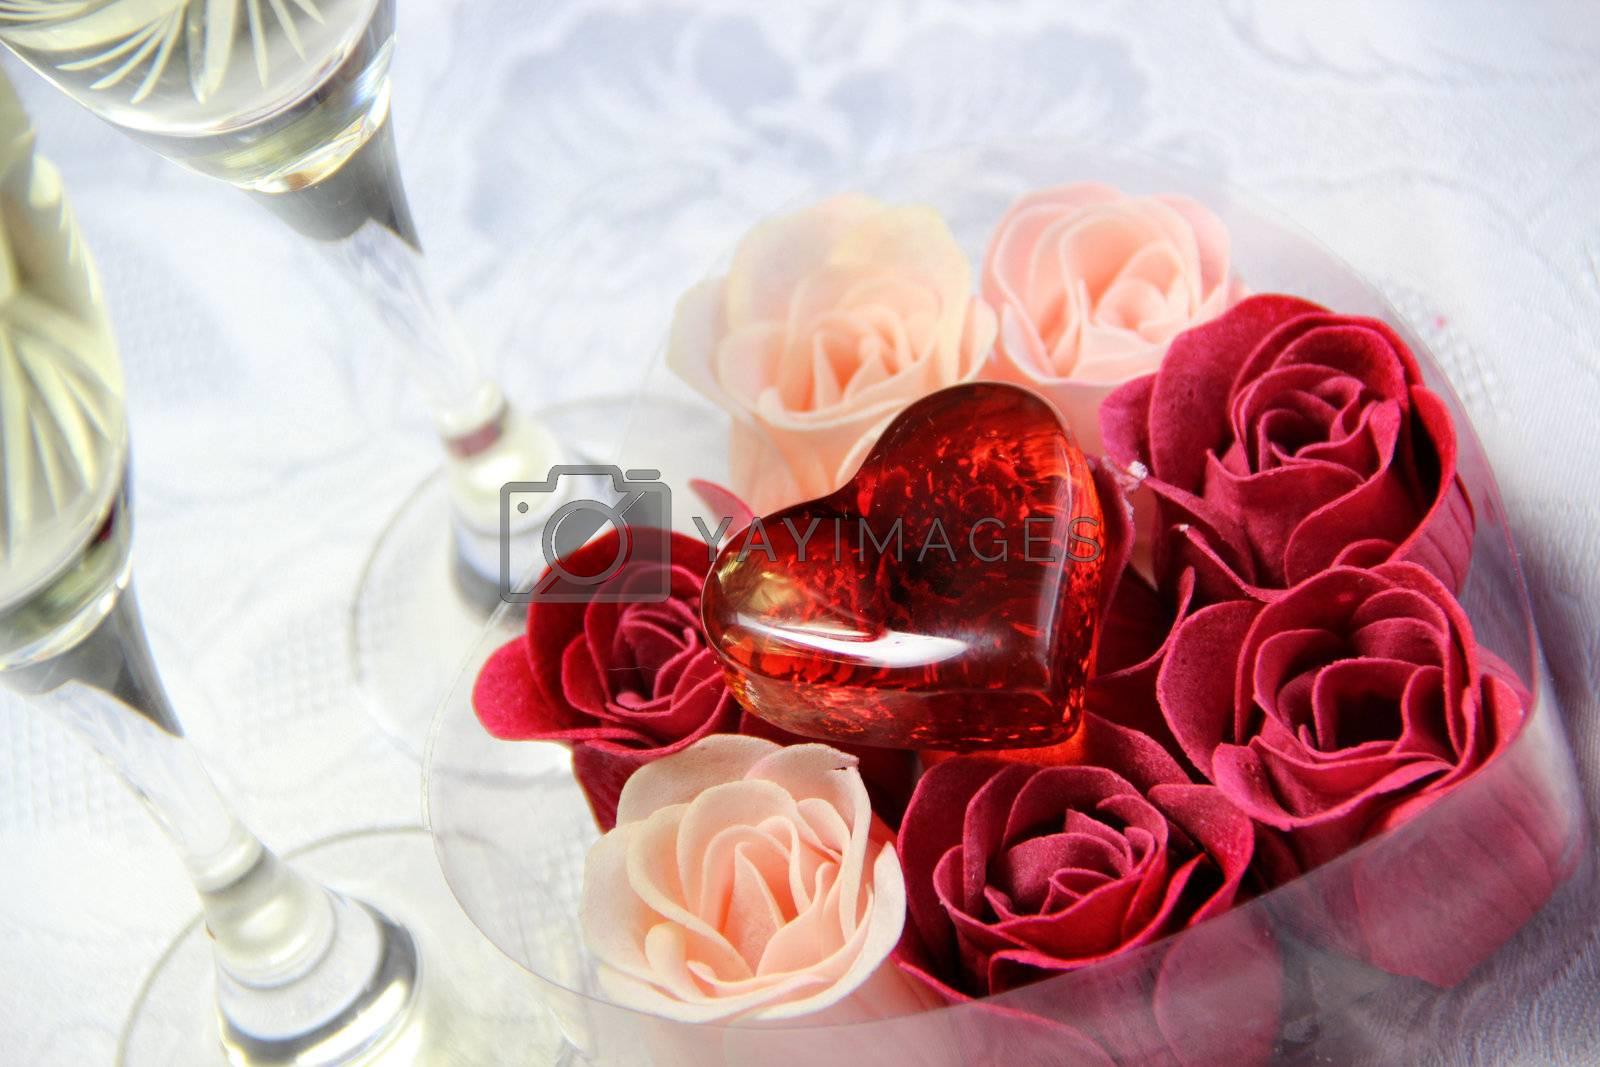 Wedding and Valentine's Day decoration